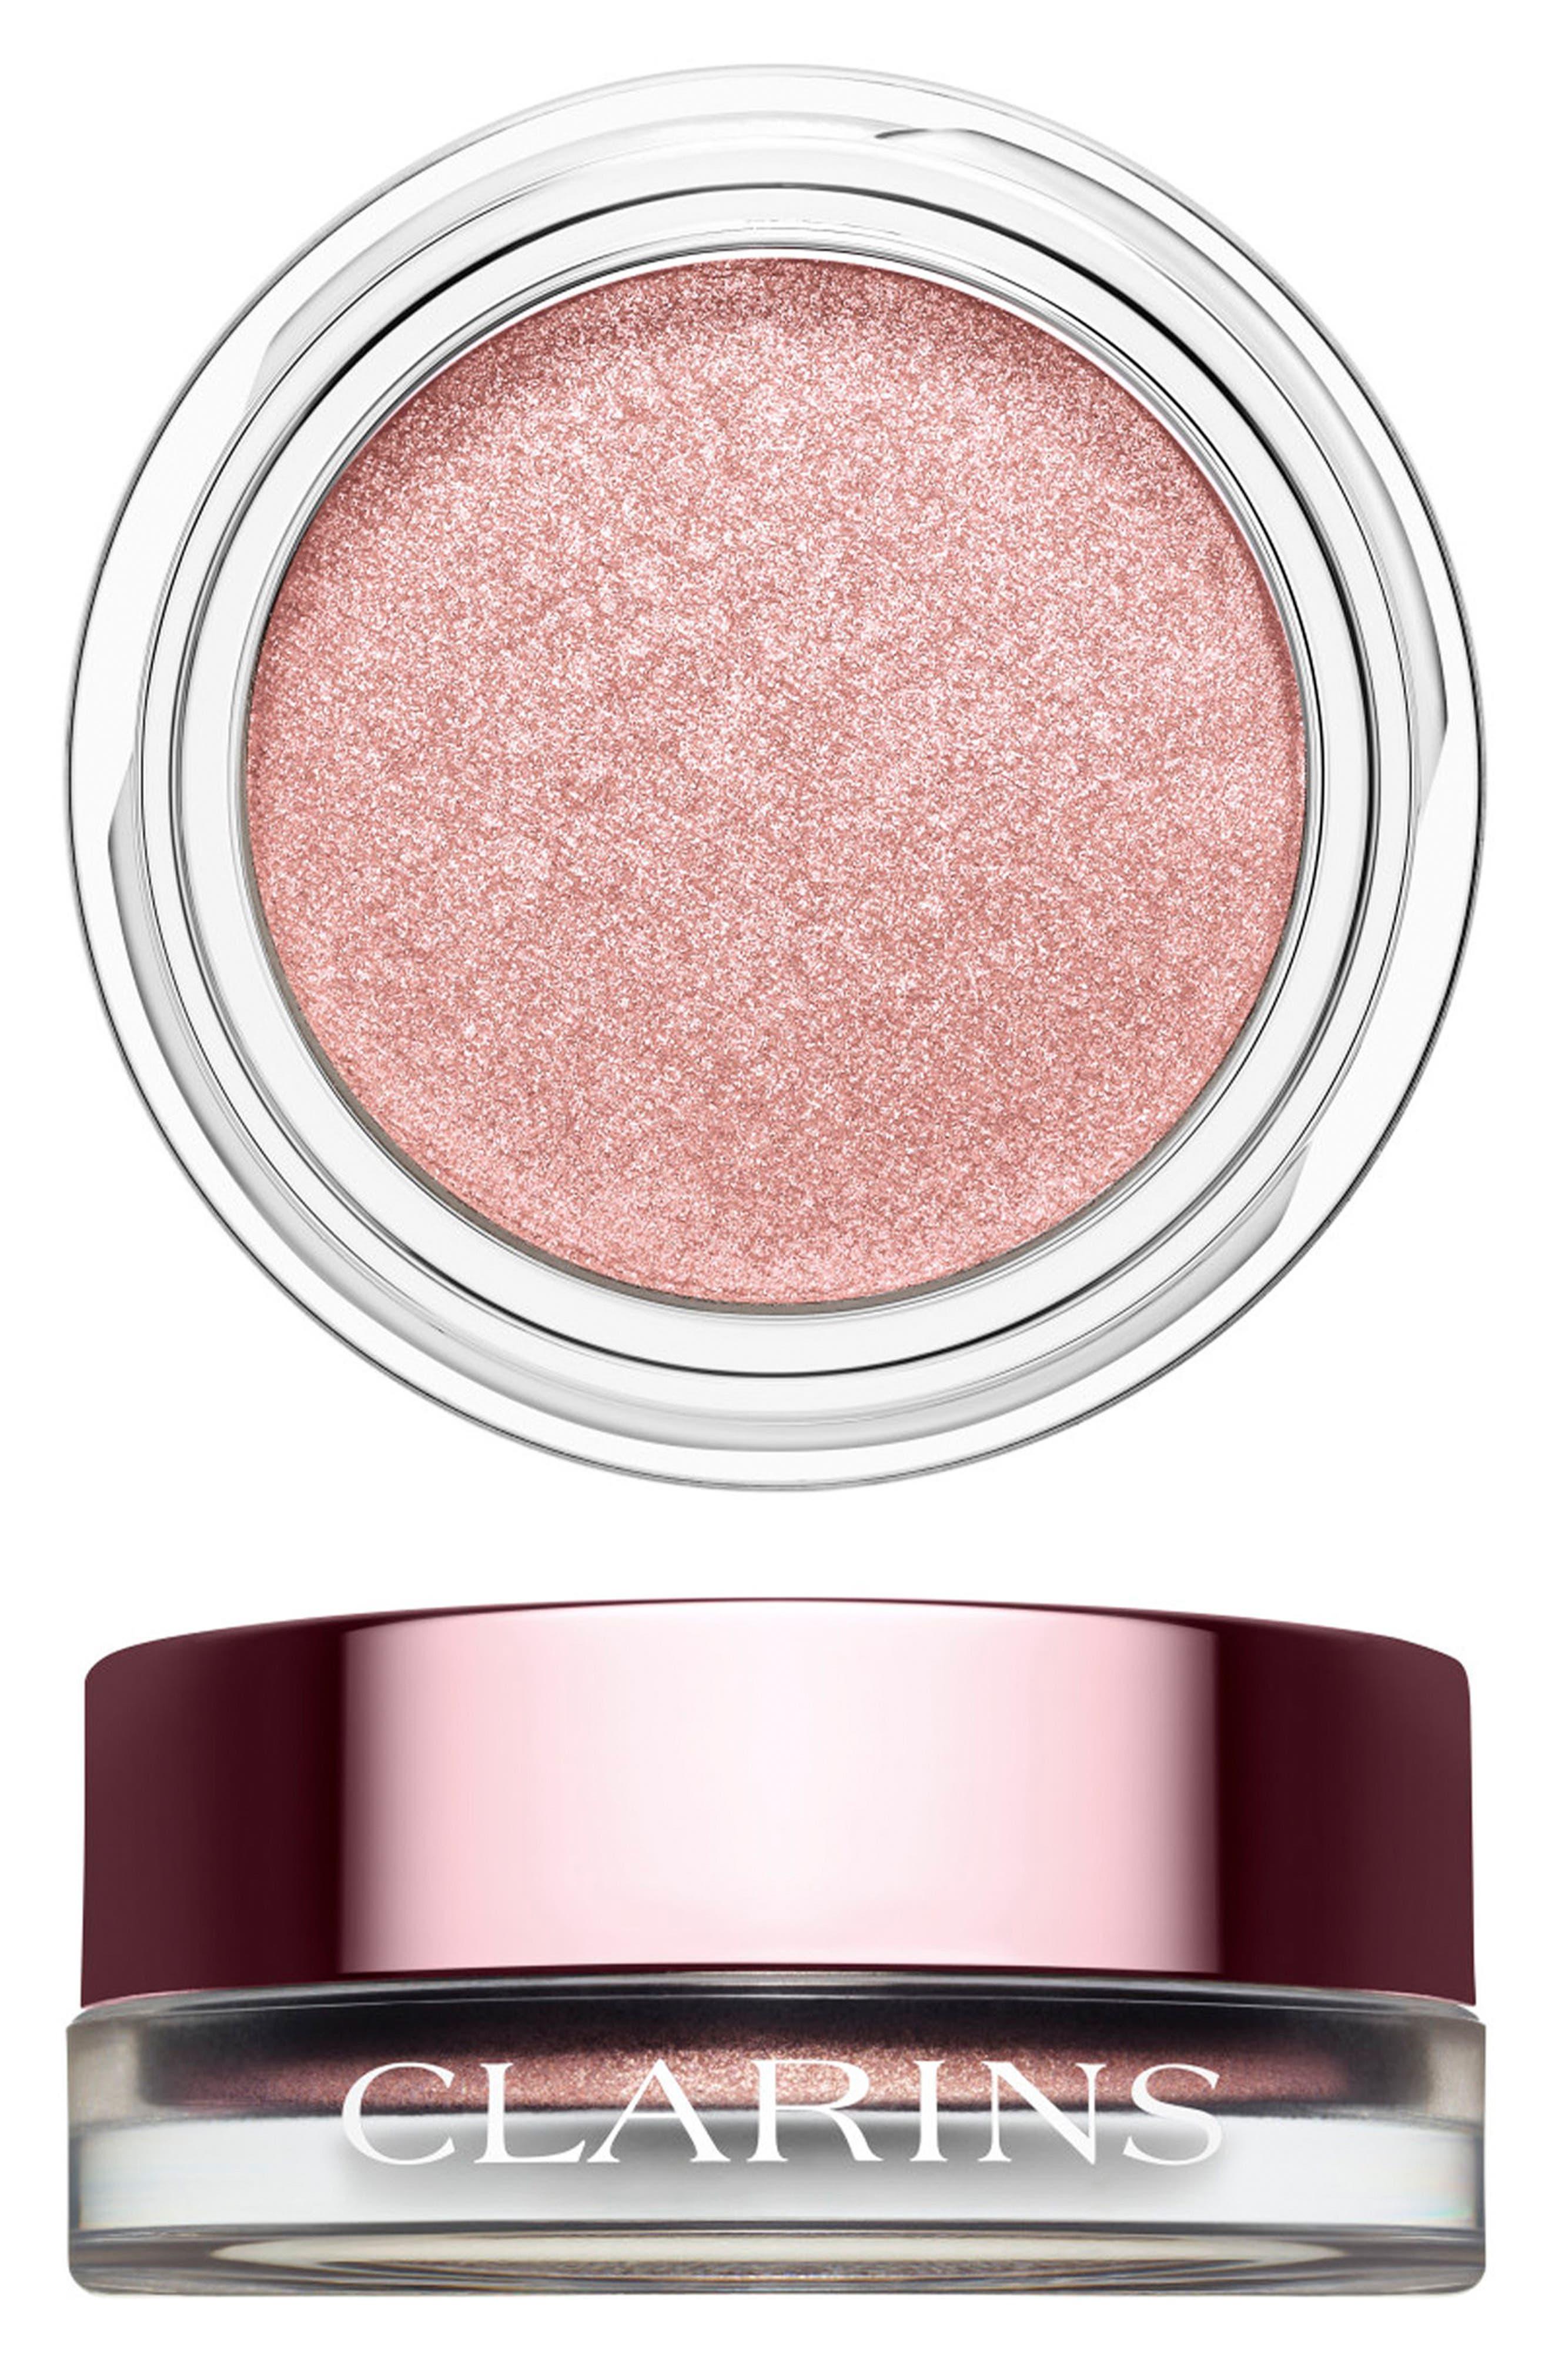 CLARINS, Ombré Iridescente Cream-to-Powder Iridescent Eyeshadow, Main thumbnail 1, color, SILVER ROSE 09